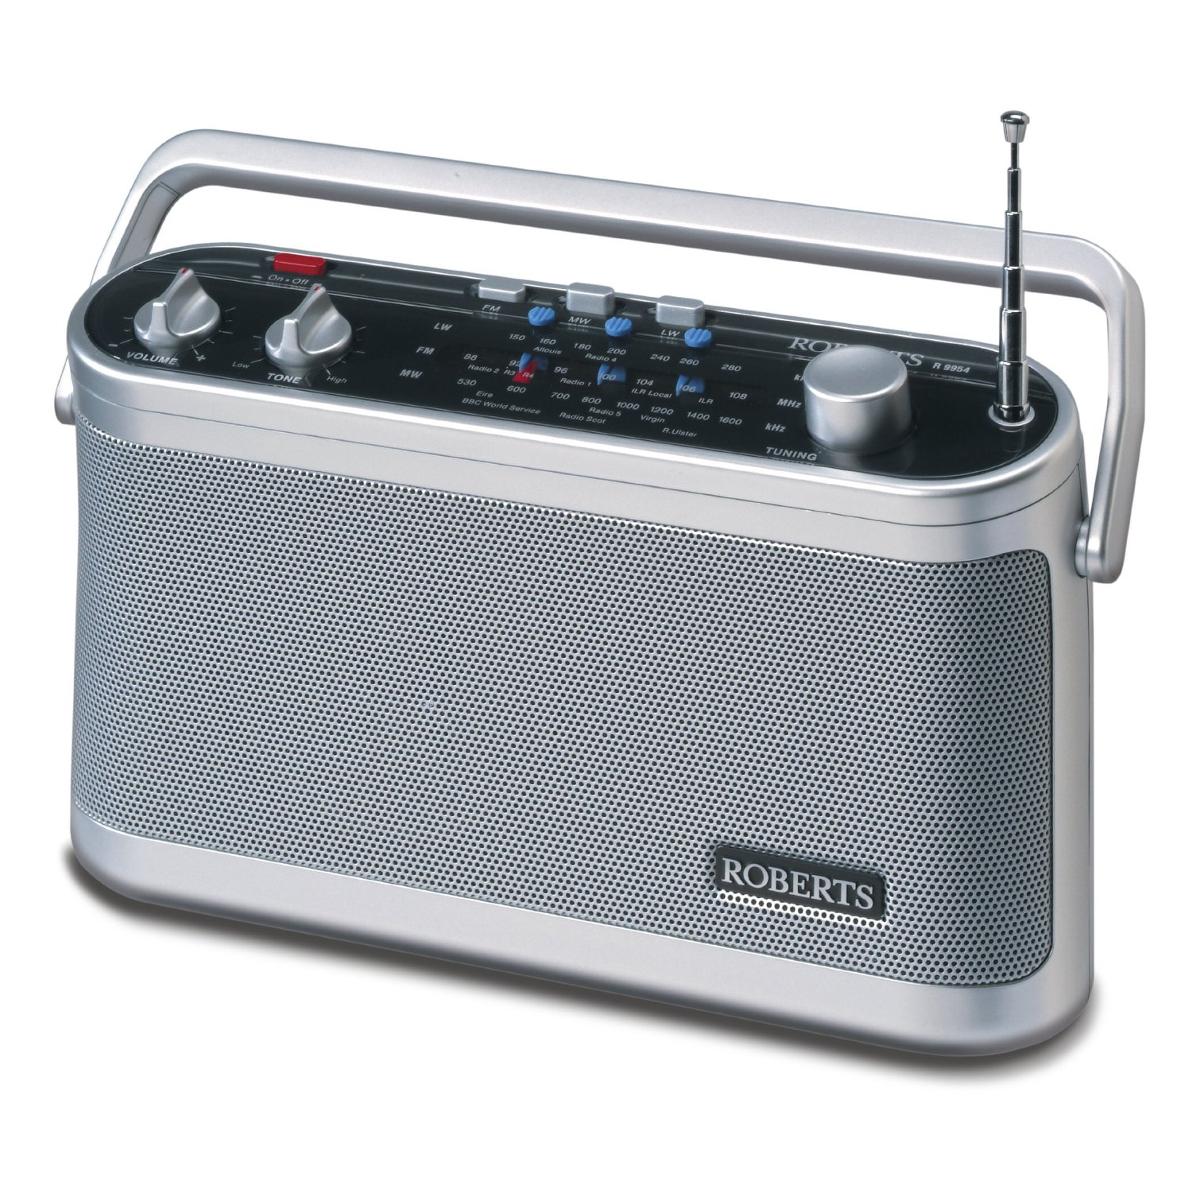 Range Style Cookers >> Roberts Radio R9954 Classic 954 Portable FM/MW/LW Radio | Hughes